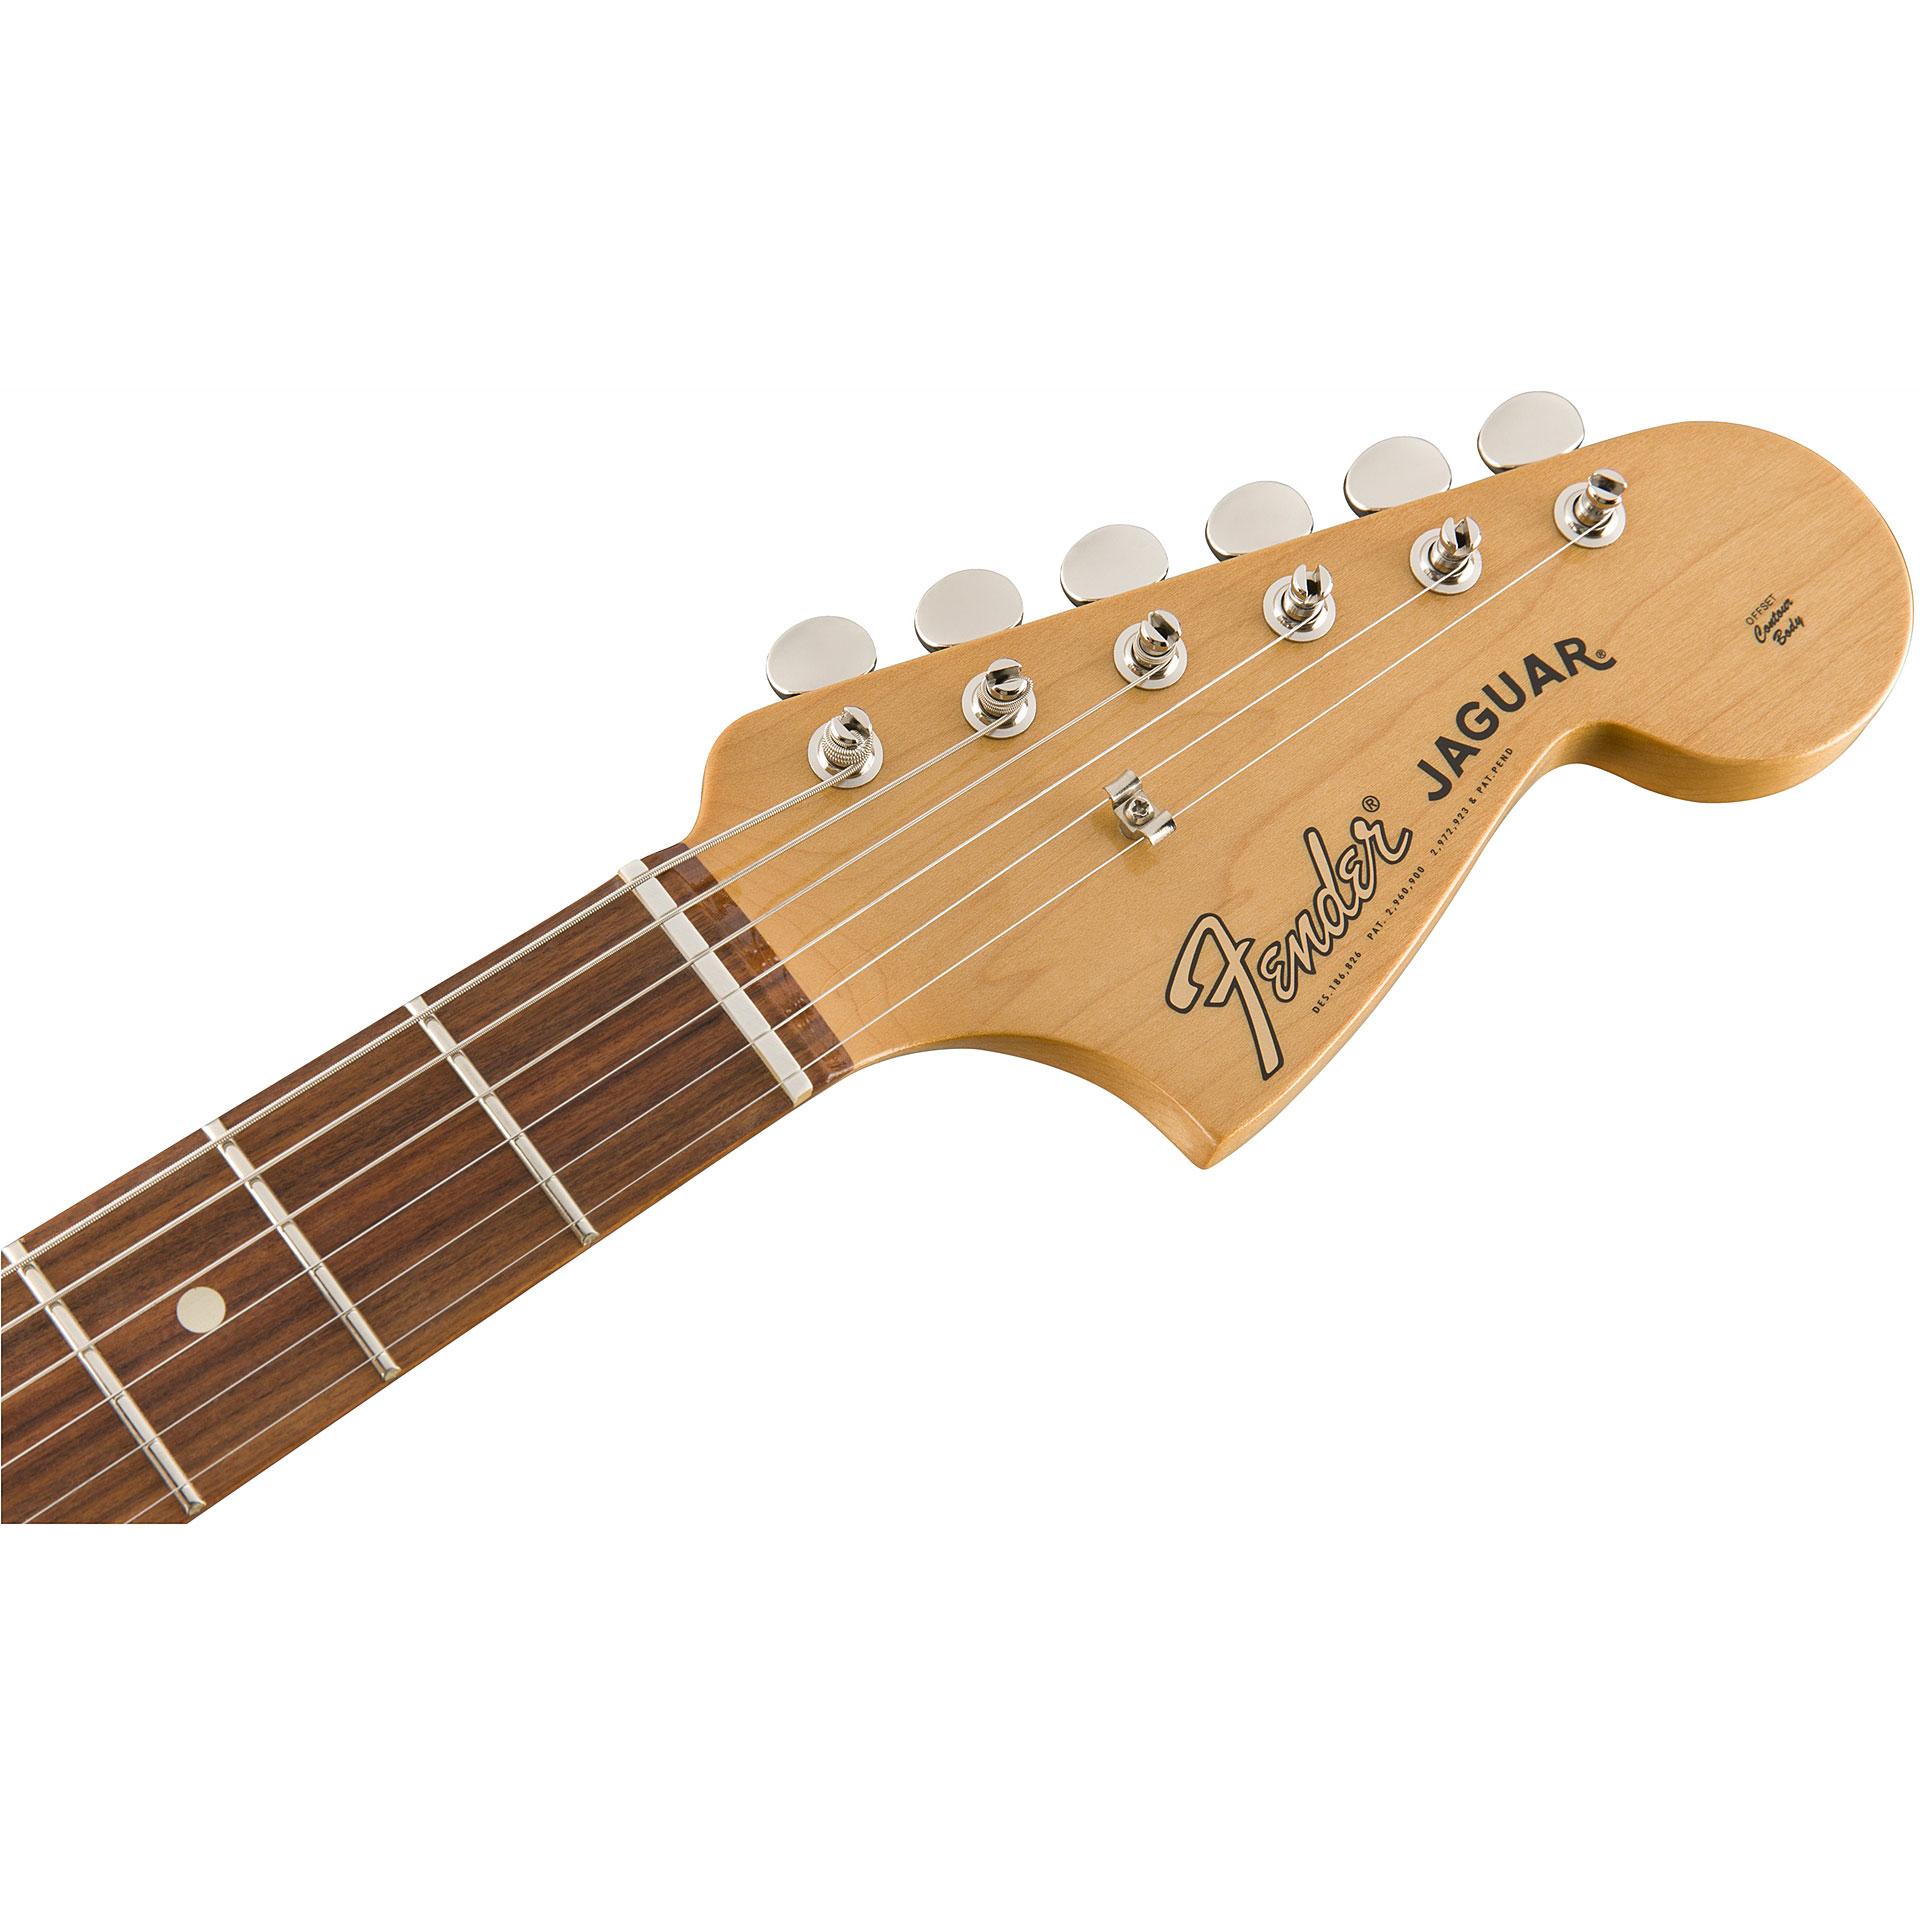 fender classic player jaguar special hh pf 3tsb guitare. Black Bedroom Furniture Sets. Home Design Ideas